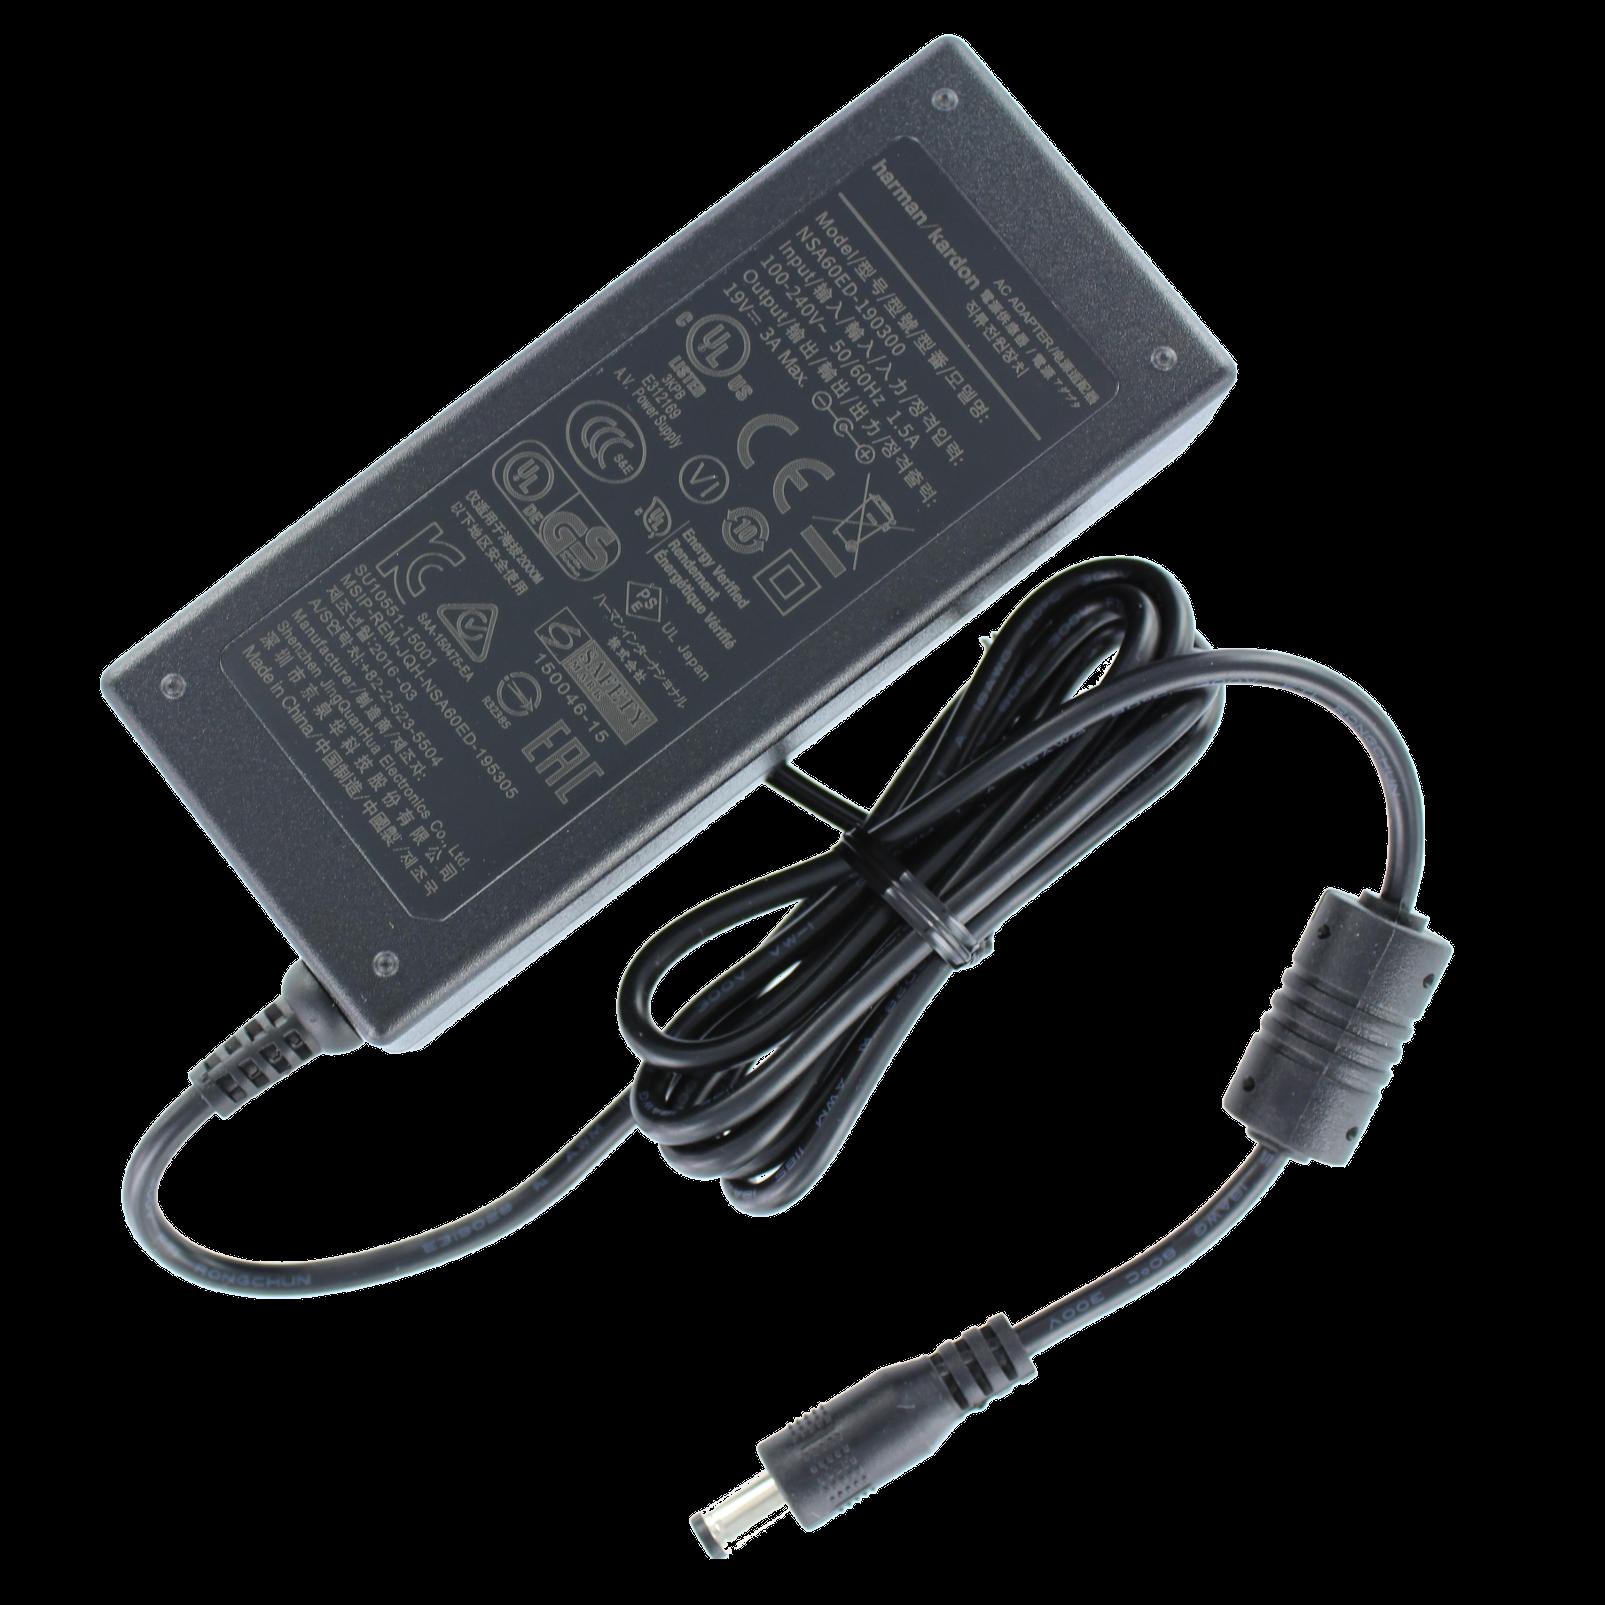 Harman Kardon Power adaptor for Go + Play - Black - Power adaptor - Hero